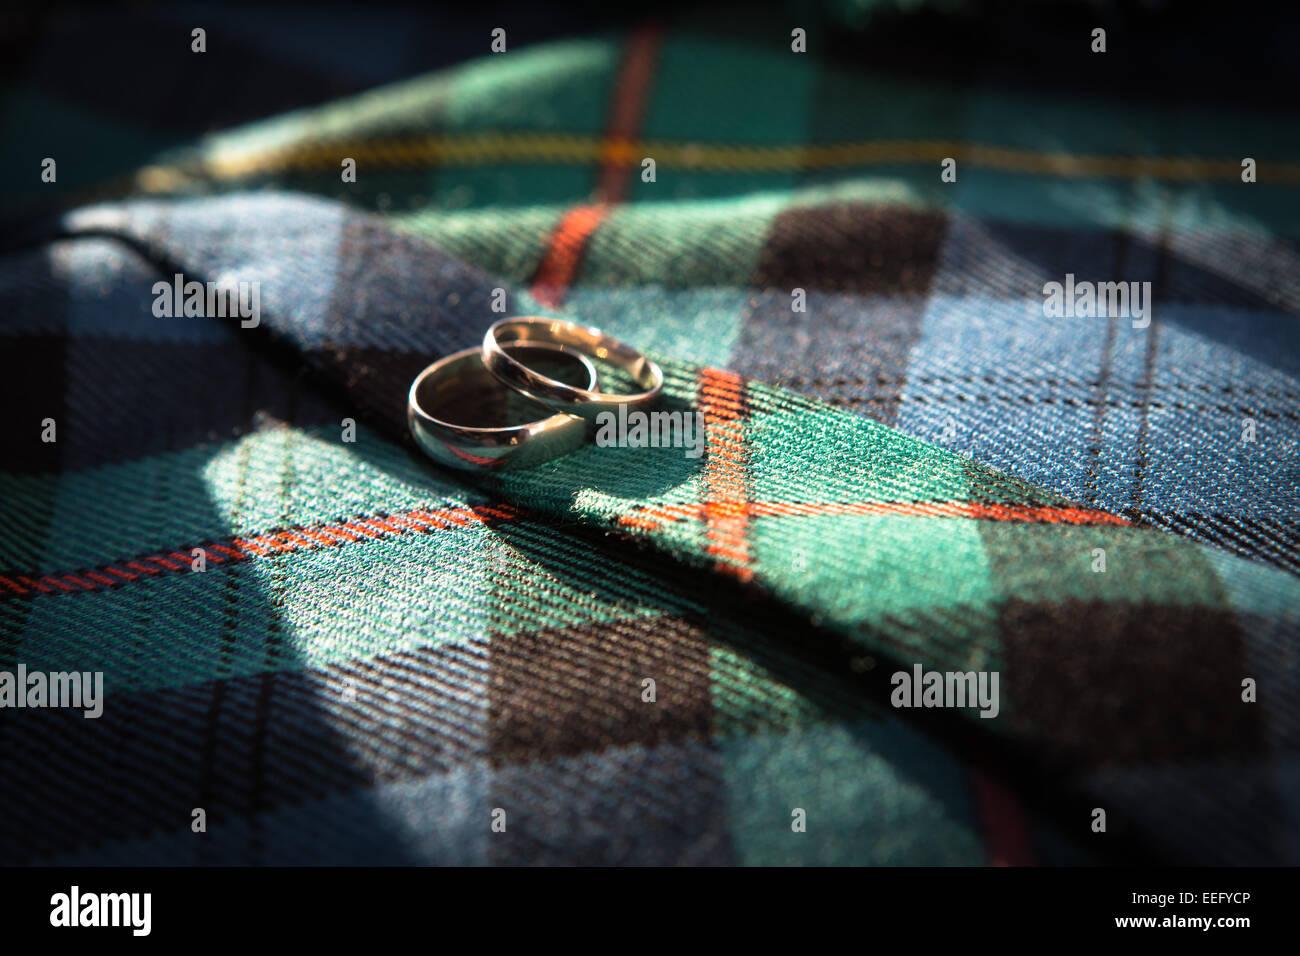 Los anillos de boda Sobre tartan material Imagen De Stock